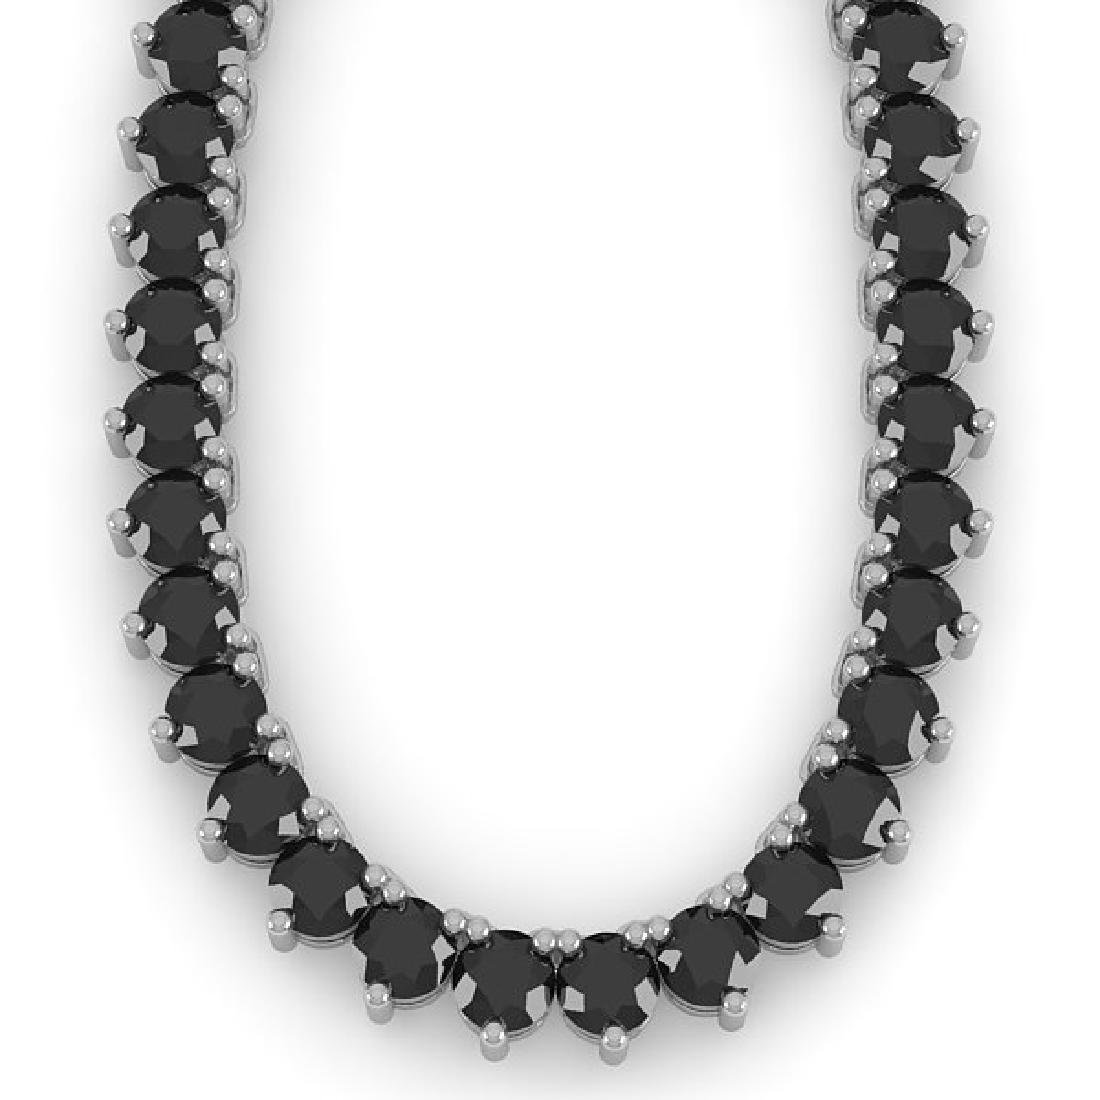 60 CTW Solitaire Certified Black VS Diamond Necklace - 2